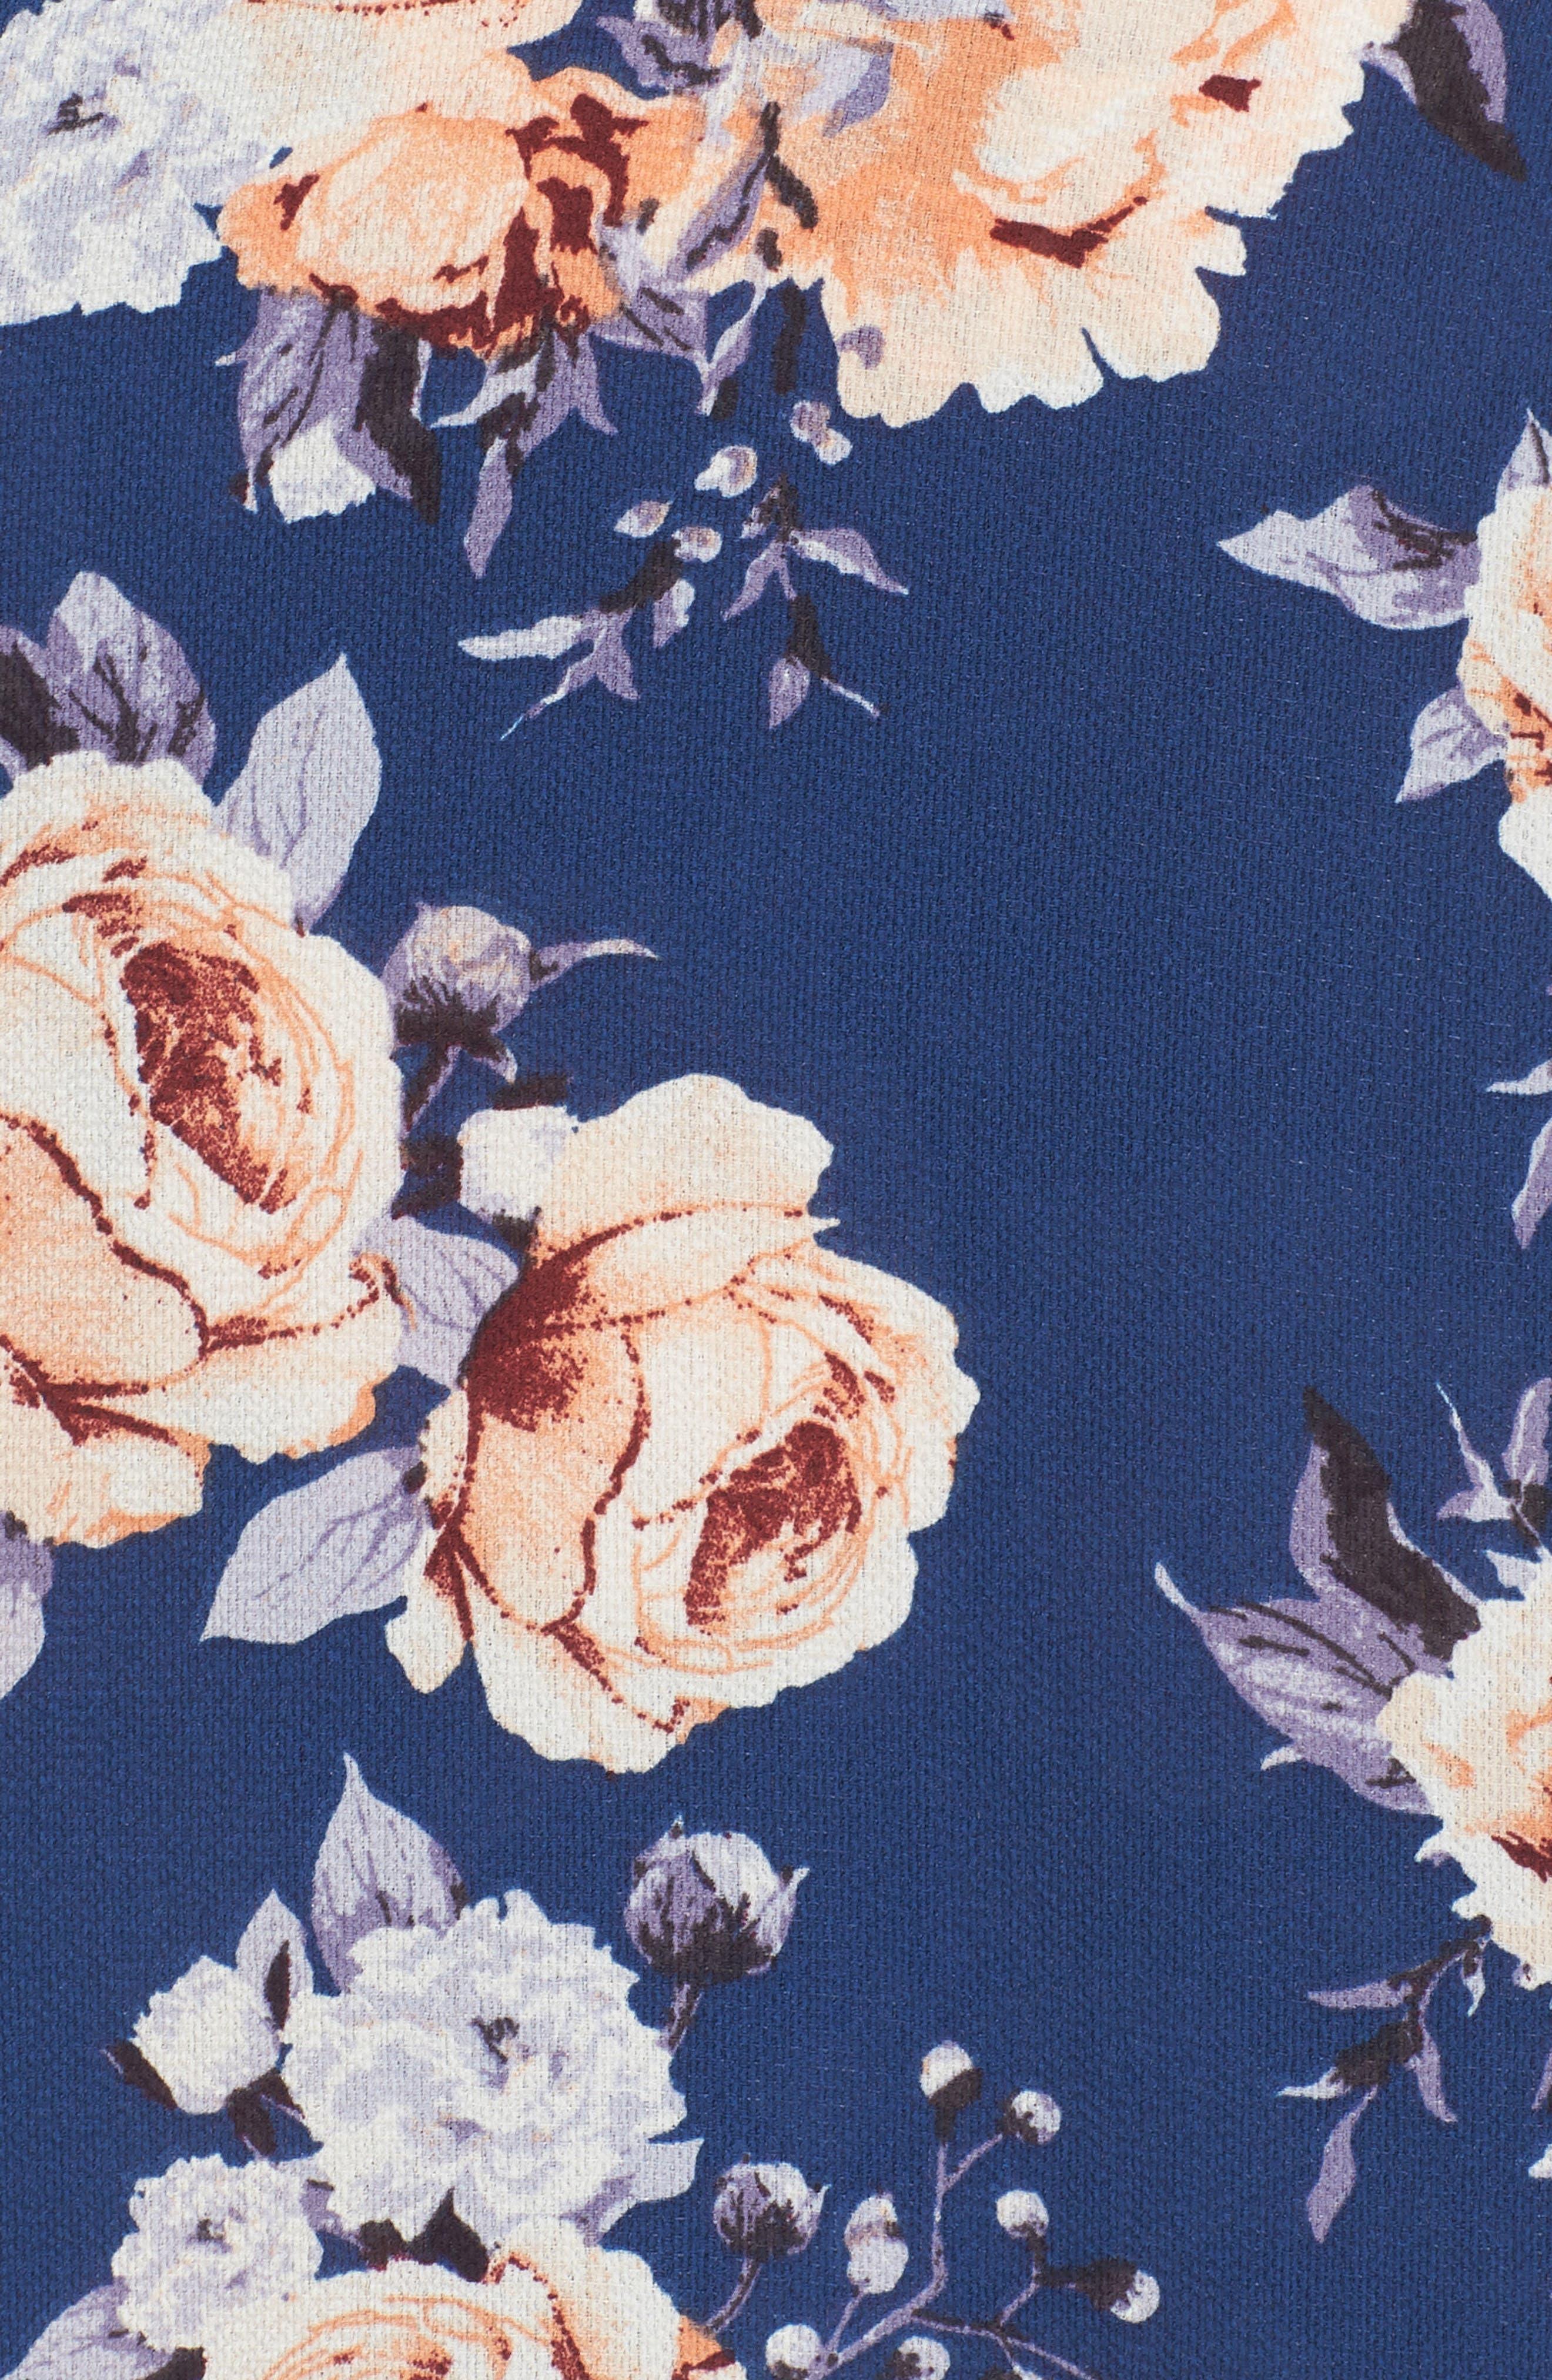 Floral Print Maxi Skirt,                             Alternate thumbnail 5, color,                             Blue Floral